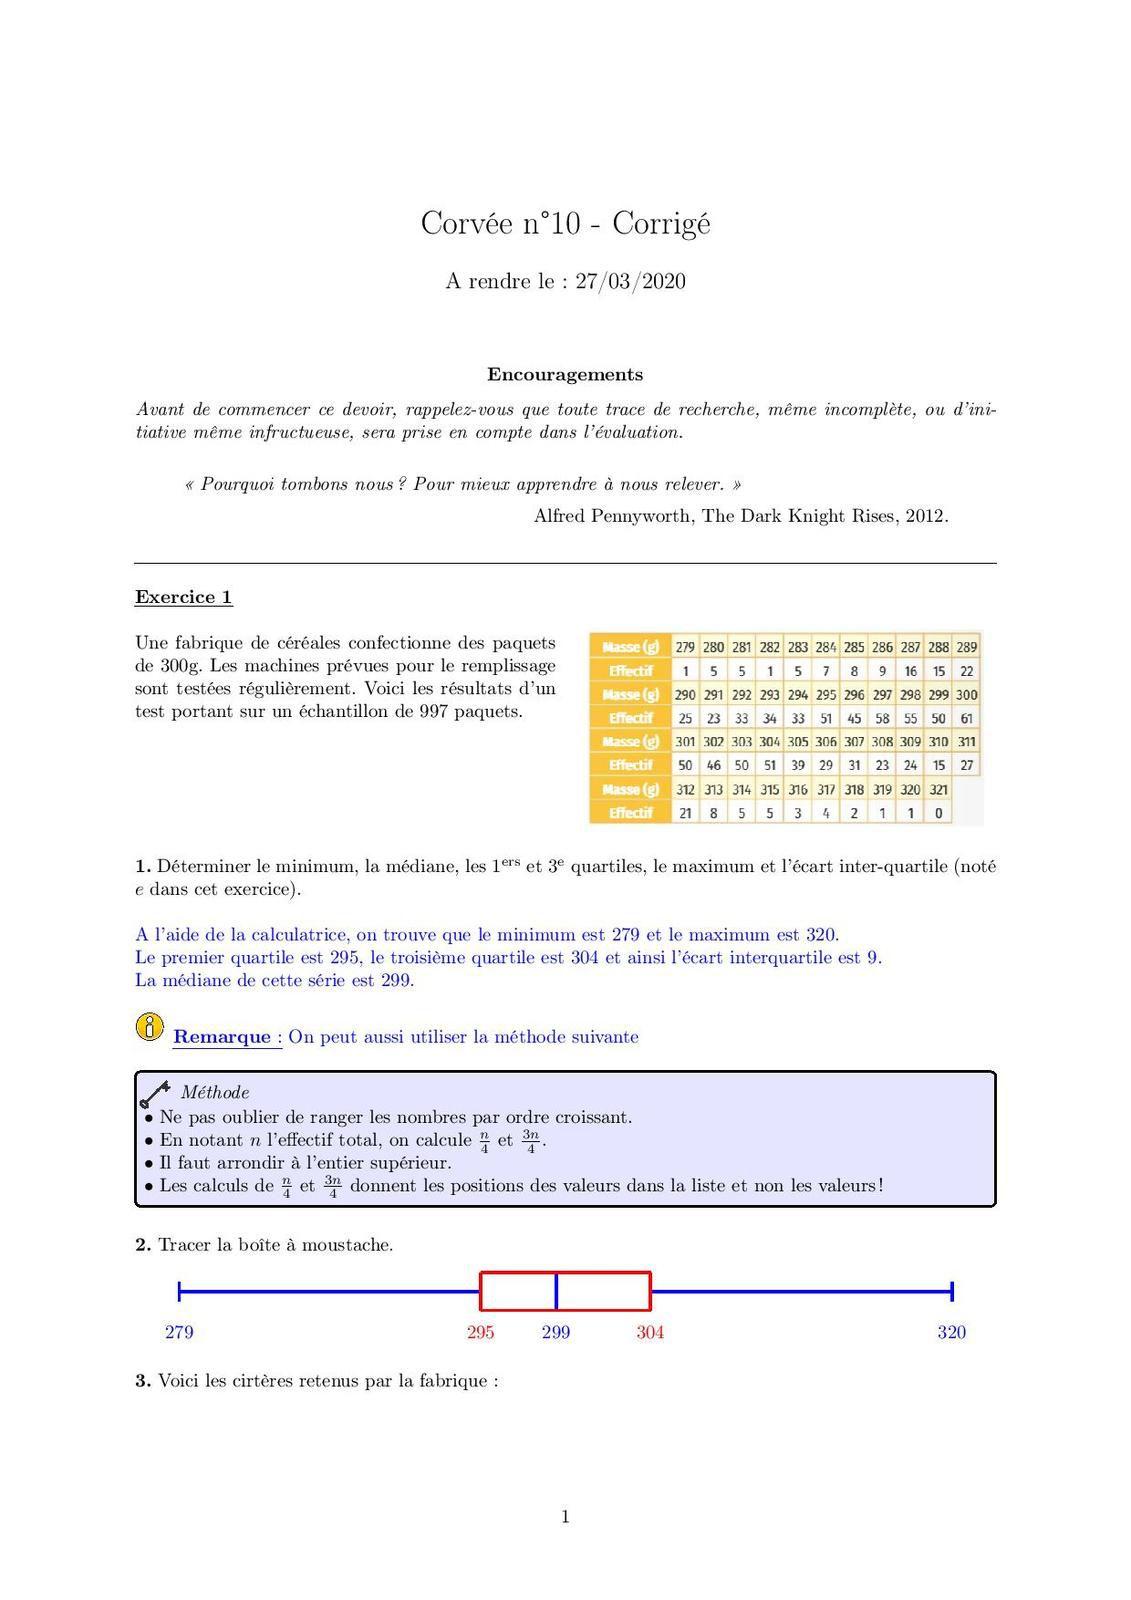 Corvée n°10 - Correction Corvée n°10